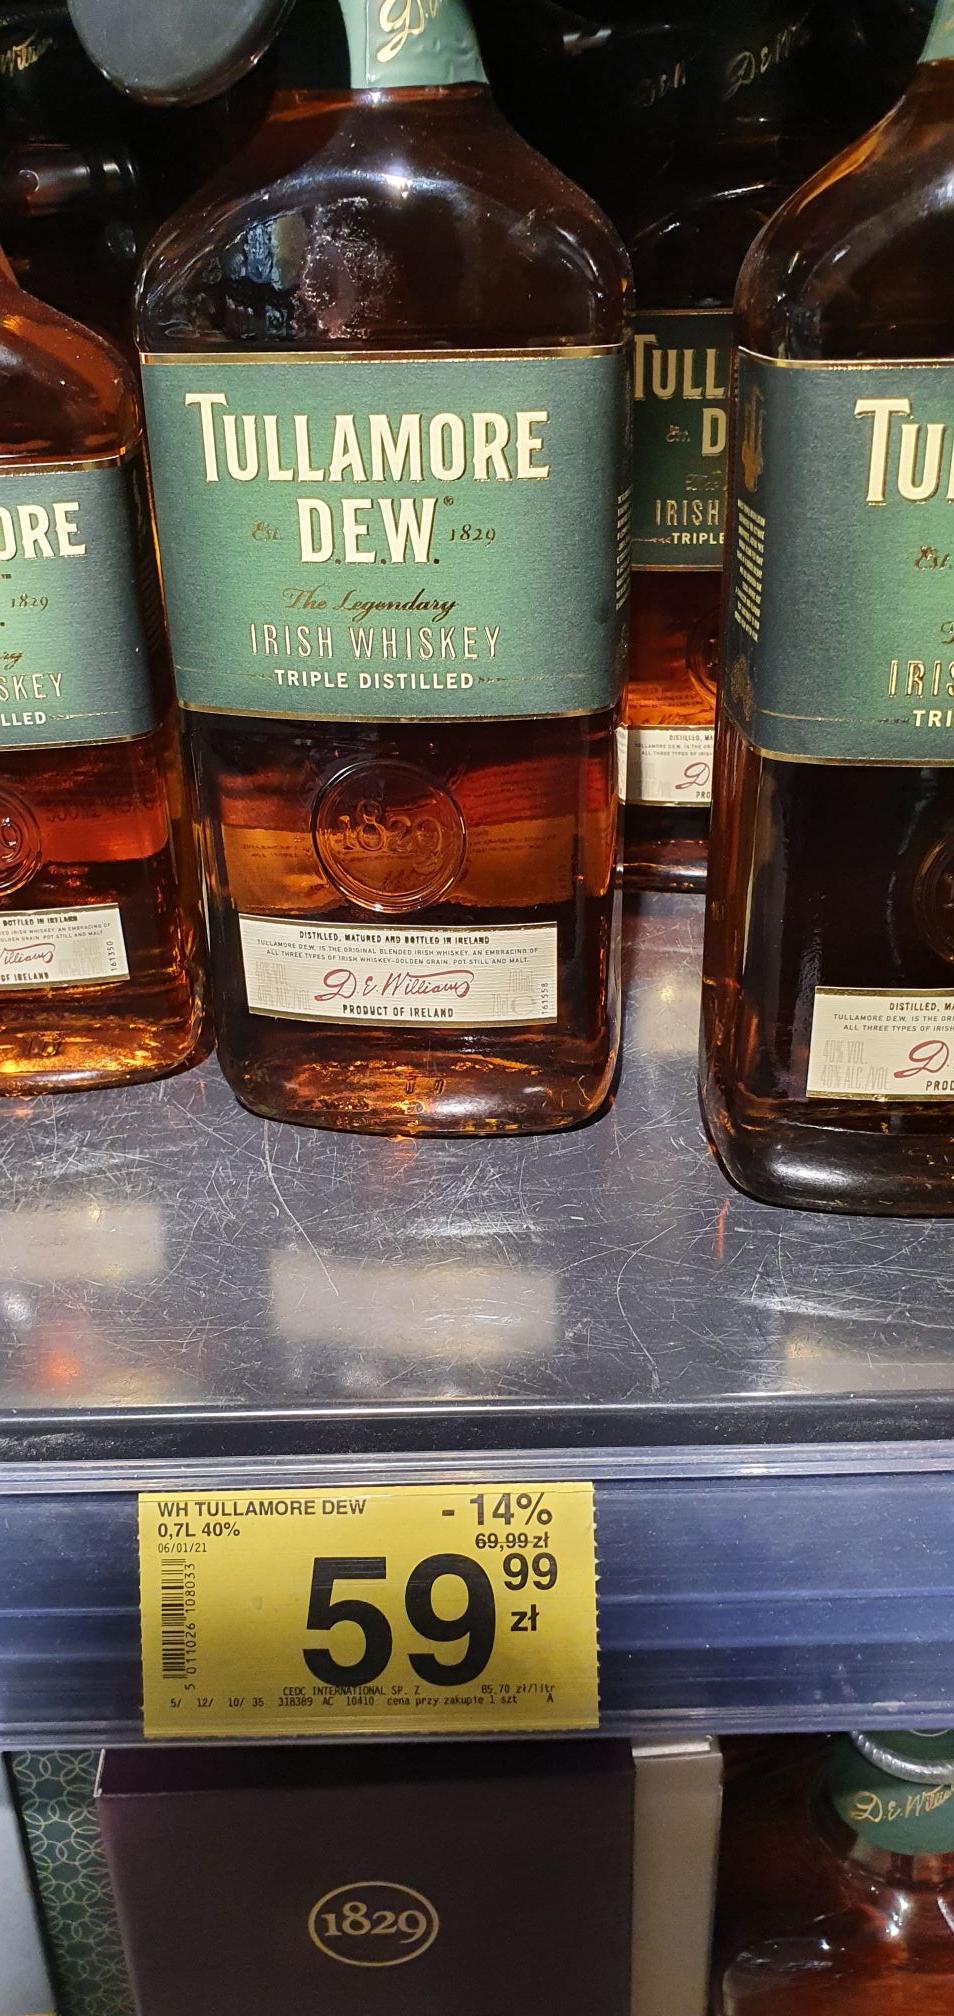 Whiskey Tullamore Dew 0,7l